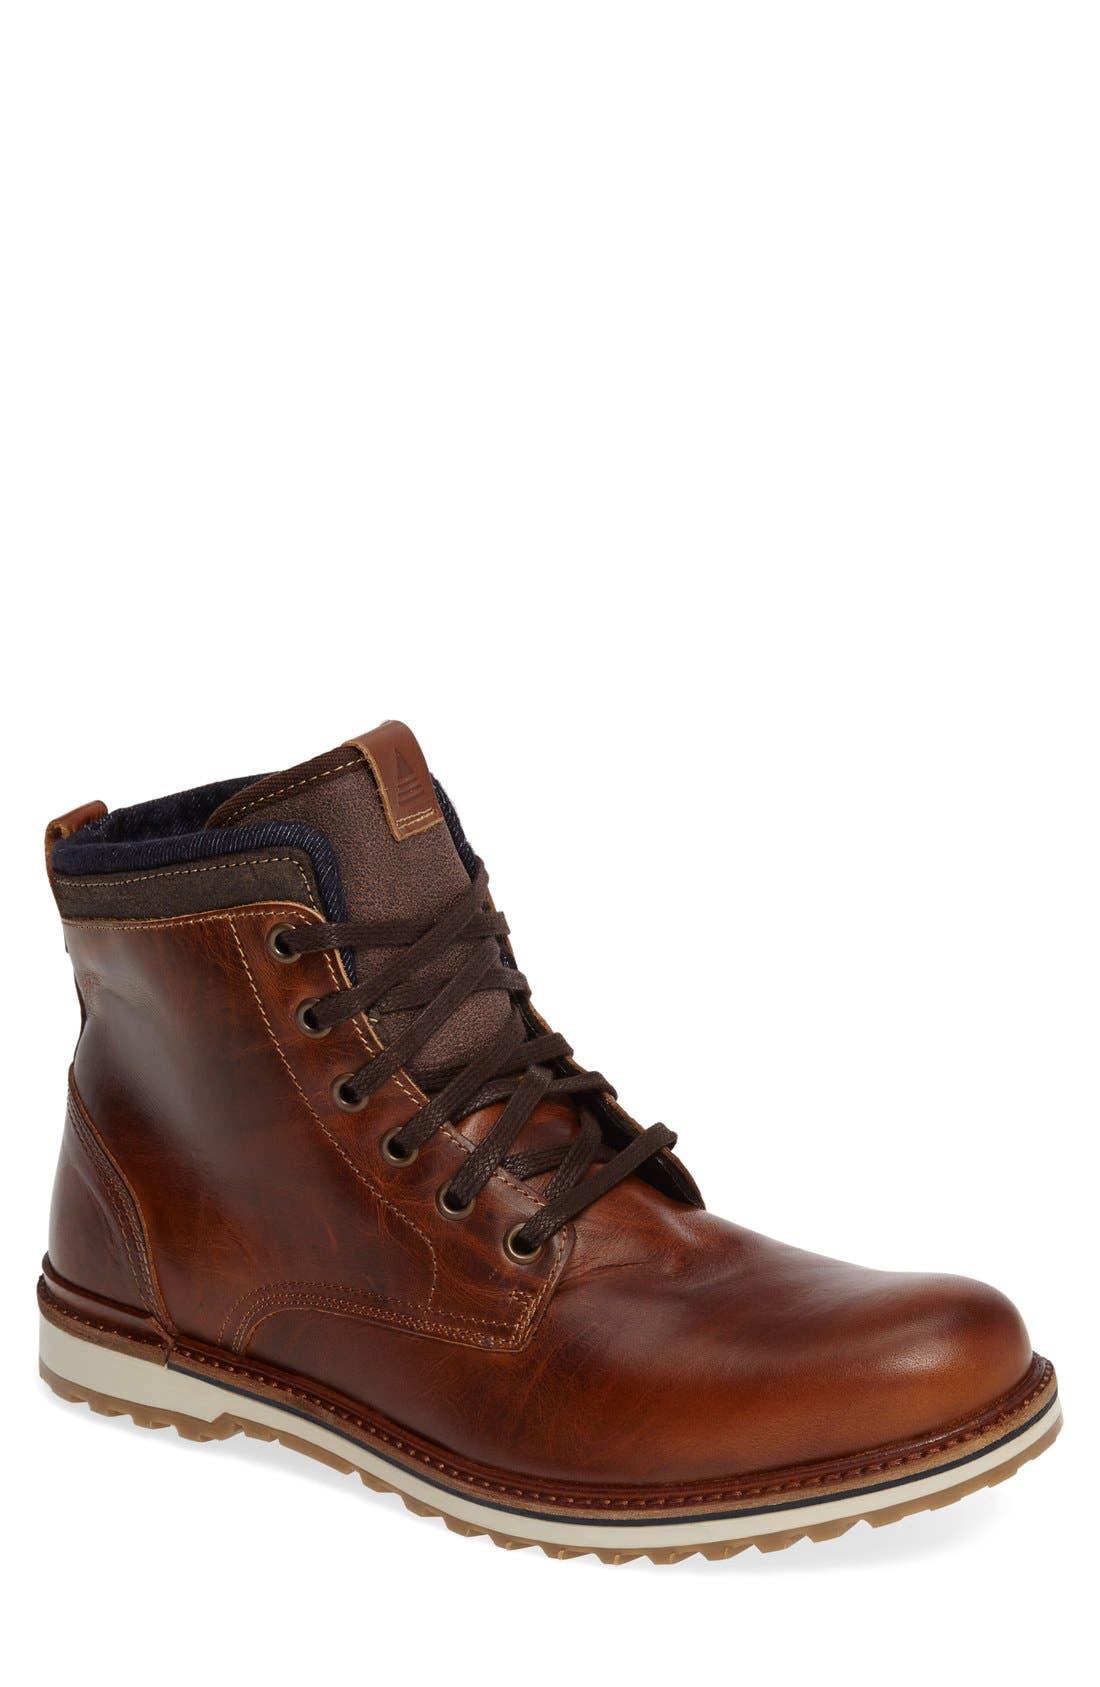 Qorellan Plain Toe Boot,                             Main thumbnail 1, color,                             240